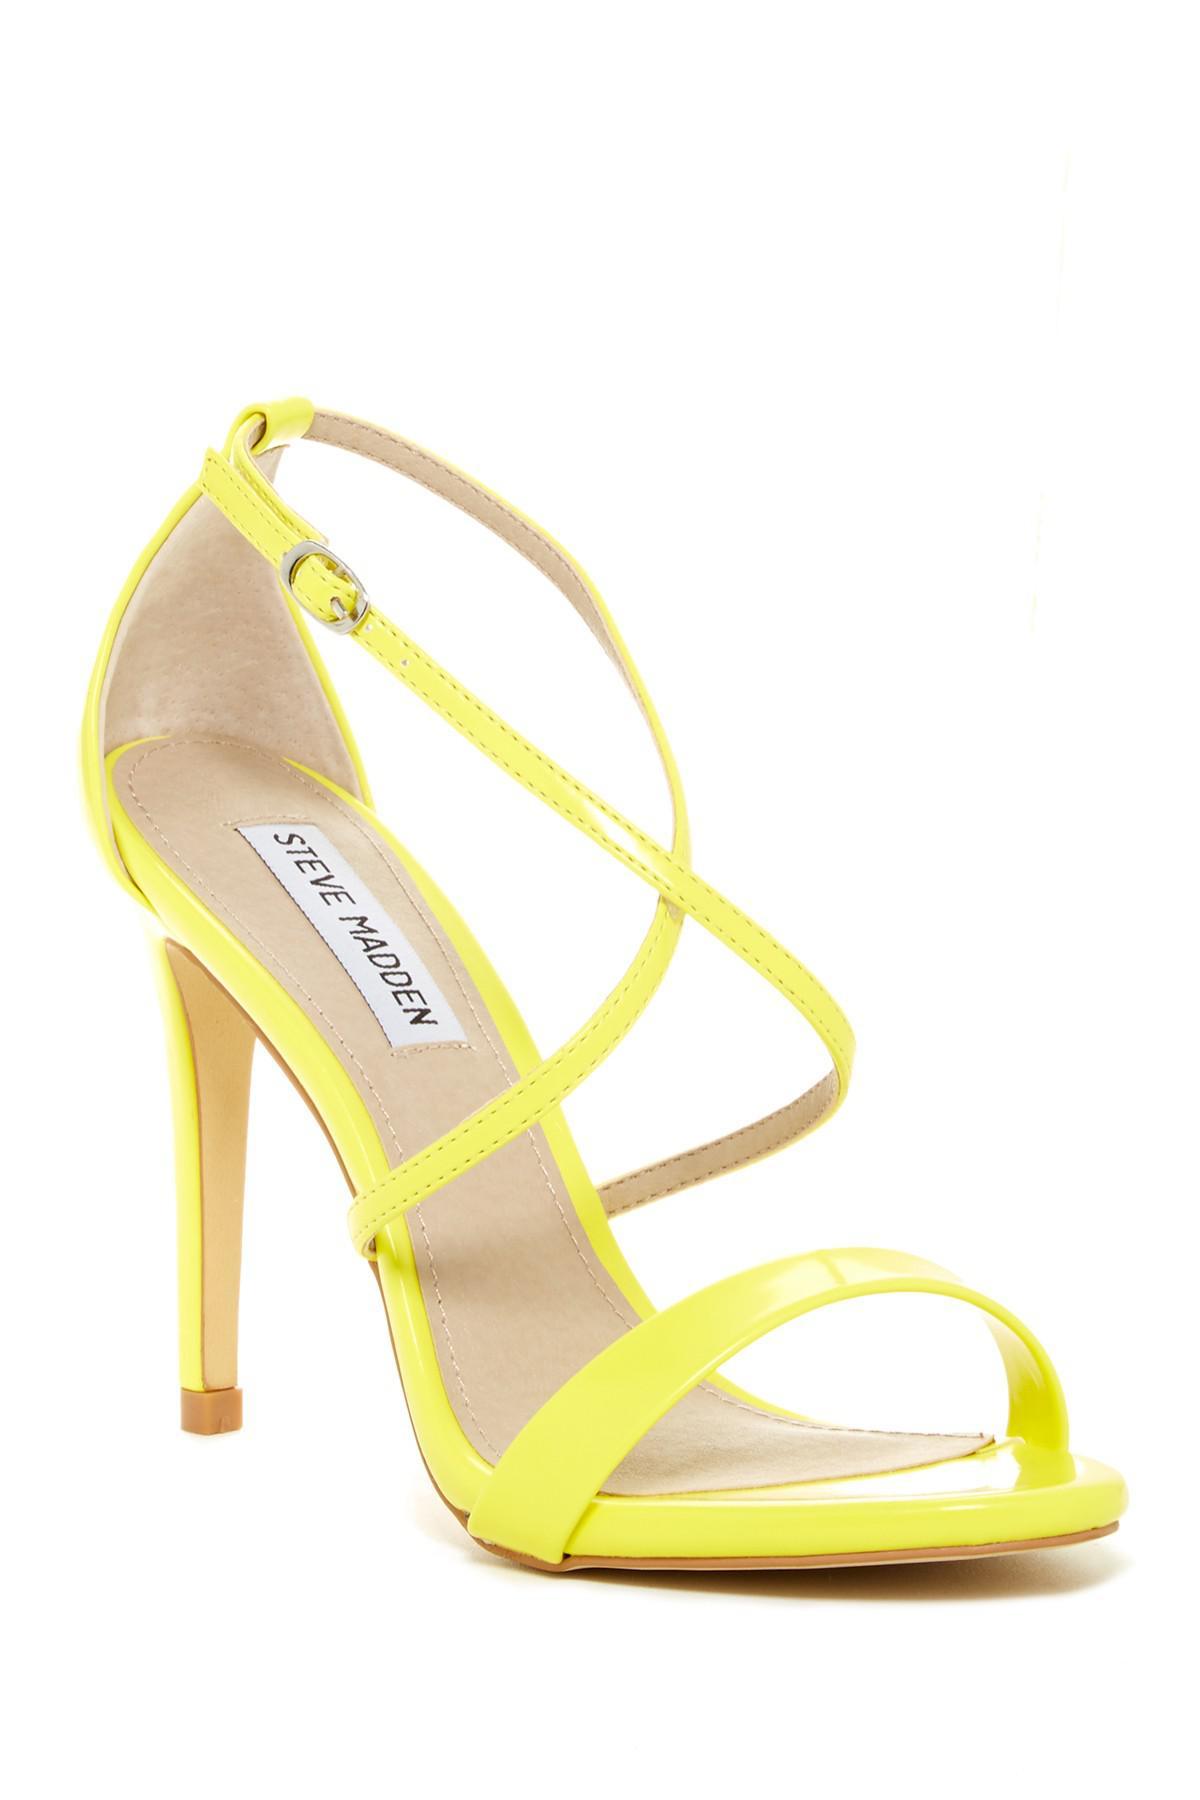 89fe2e588f2 Lyst - Steve Madden Floriaa Heel Sandal in Yellow